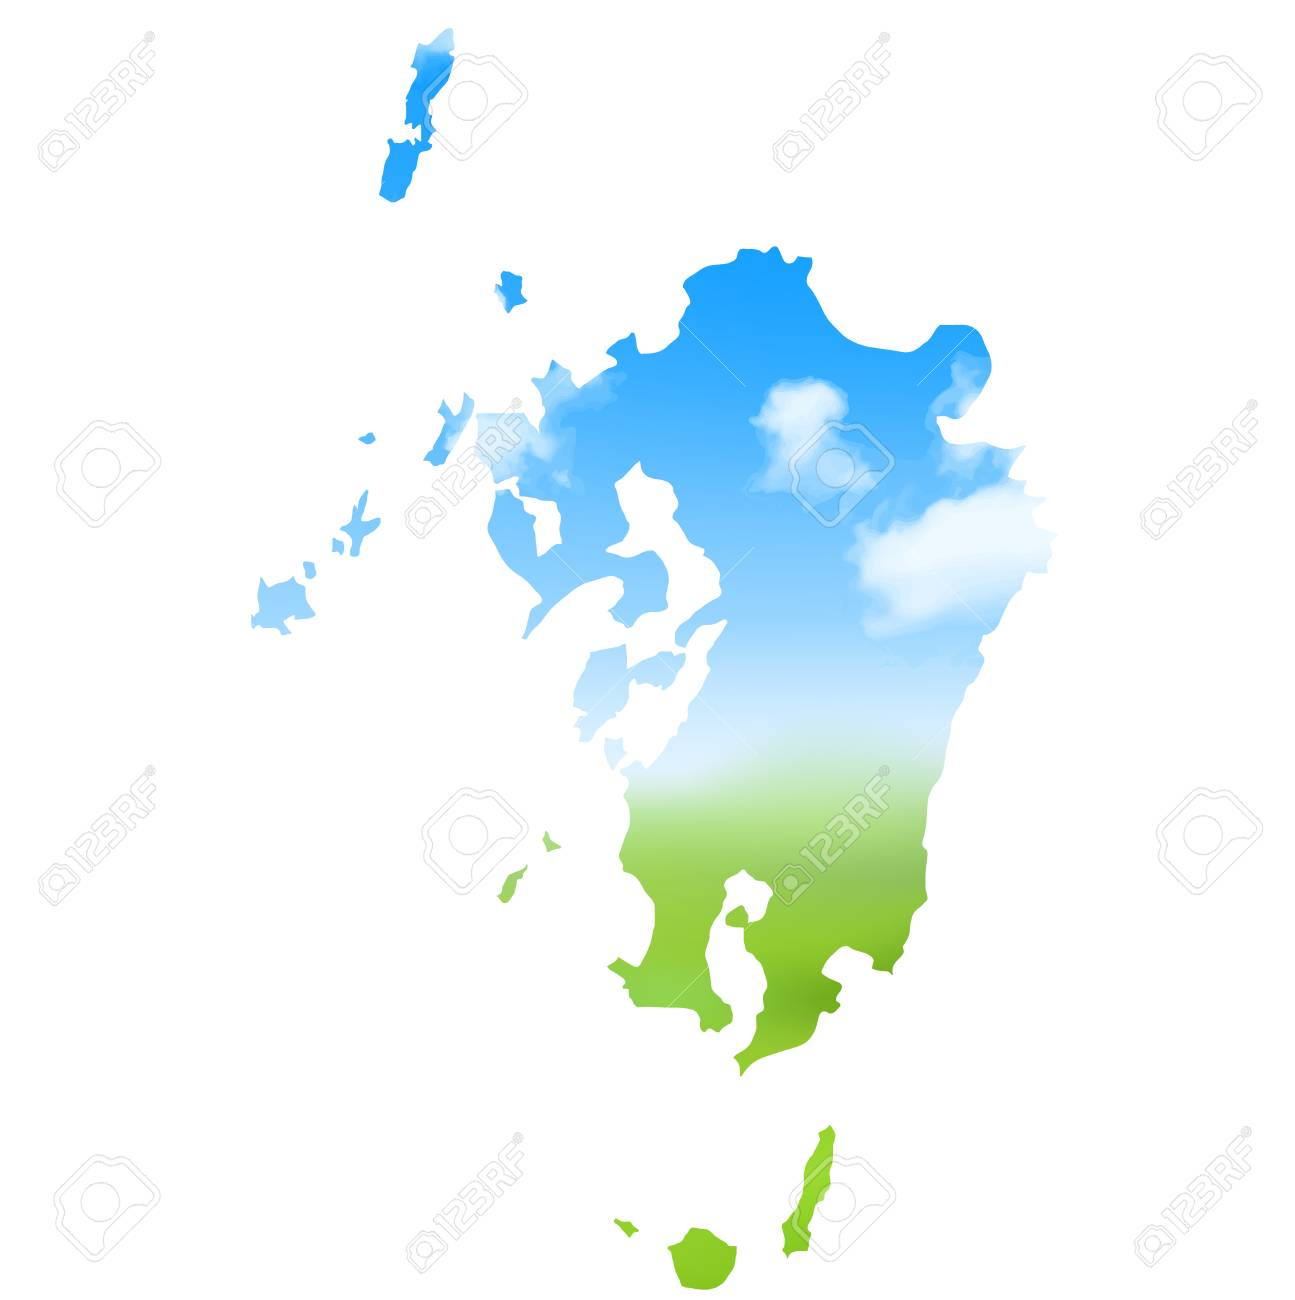 Kyushu Map landscape icon on hainan map, okinawa island, fukuoka map, kuril islands, hiroshima map, sakhalin island map, ryukyu islands map, miyazaki map, kagoshima prefecture, kanto map, japanese archipelago, japanese archipelago map, ryukyu islands, fukuoka prefecture, japan map, okinawa map, manchurian plain map, nagasaki prefecture, gobi desert map, shikoku map, sea of japan, japanese alps map, hokkaido map, honshu map, sumatra map, bangkok map, loess plateau map, kuril islands map, okinawa prefecture,